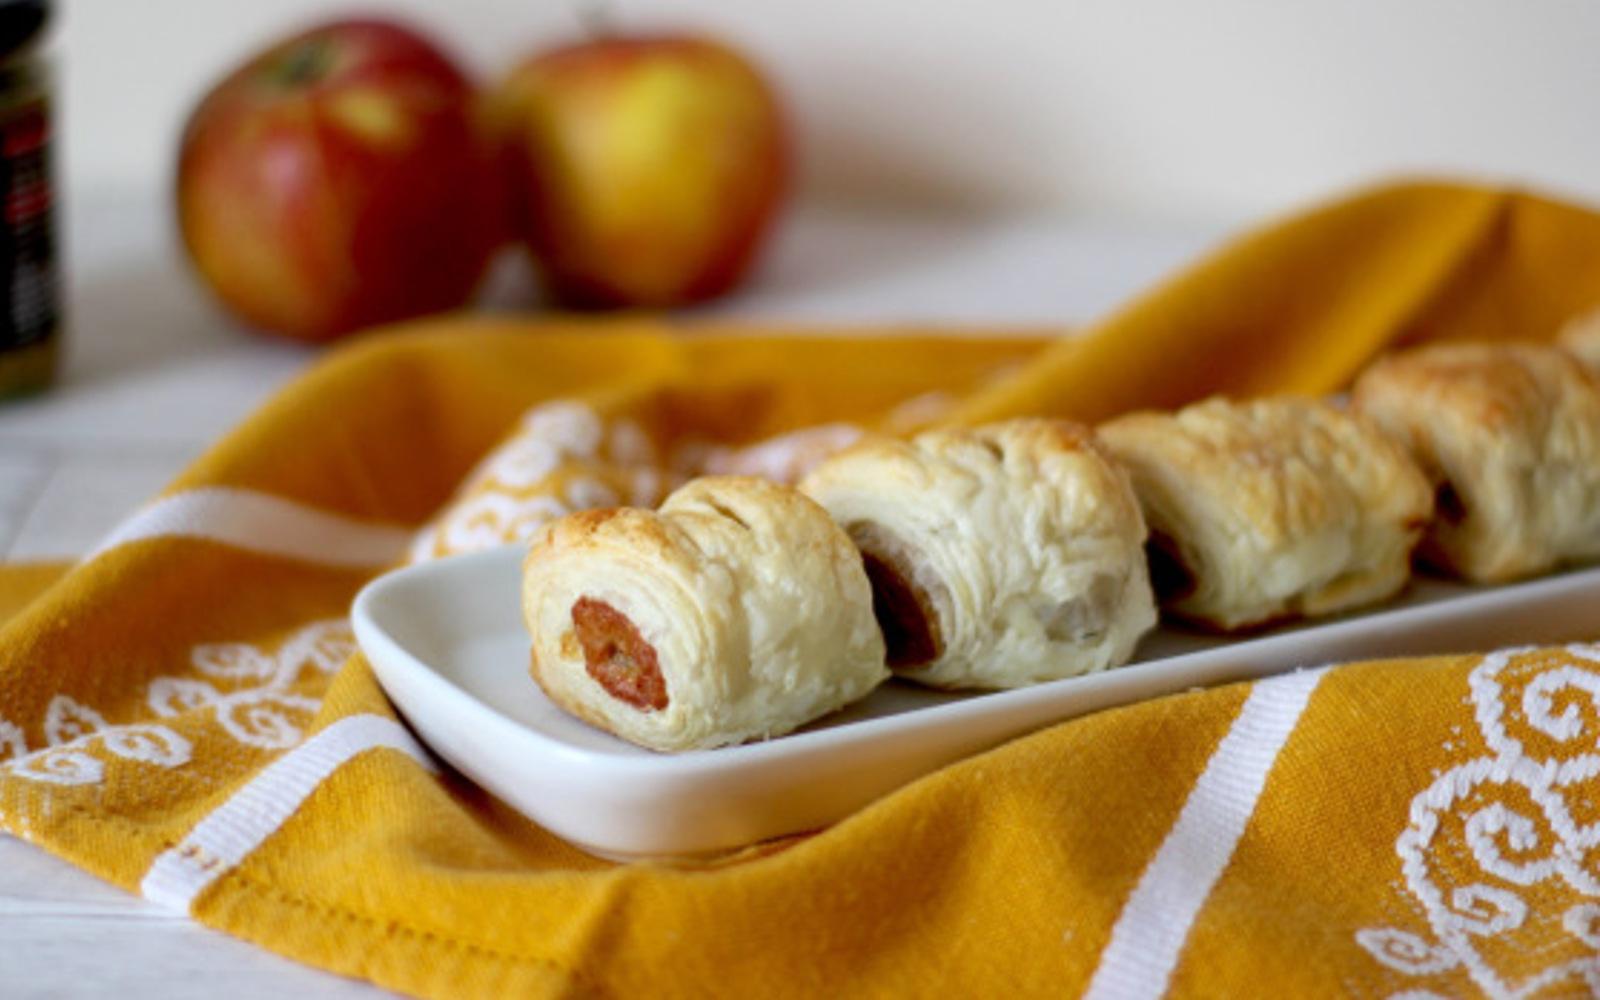 Vegan 'Pork' and Apple Sausage Rolls